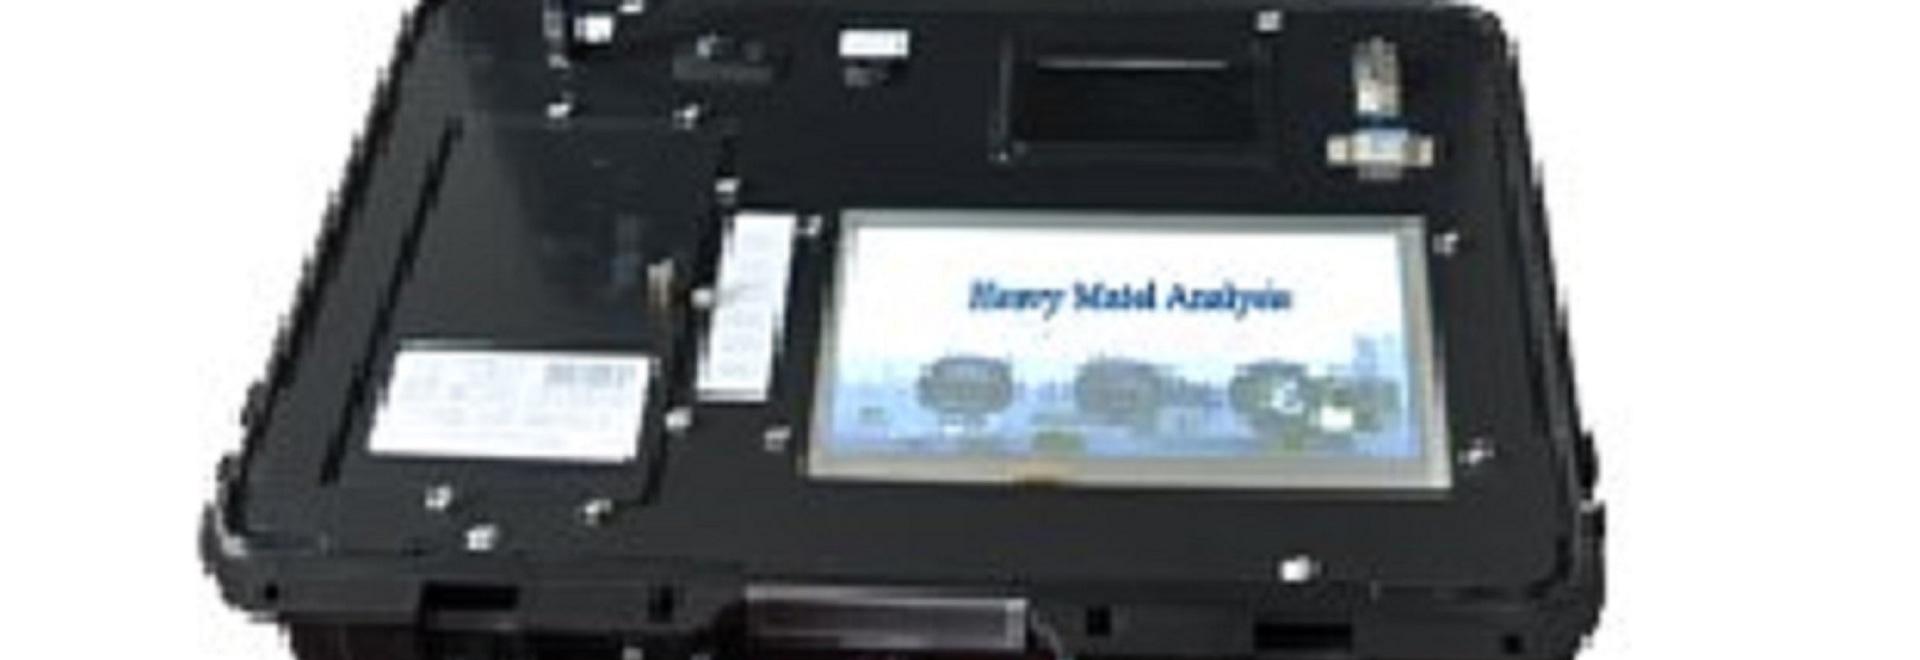 Model AAP-300 Portable Heavy Metals Analyzer